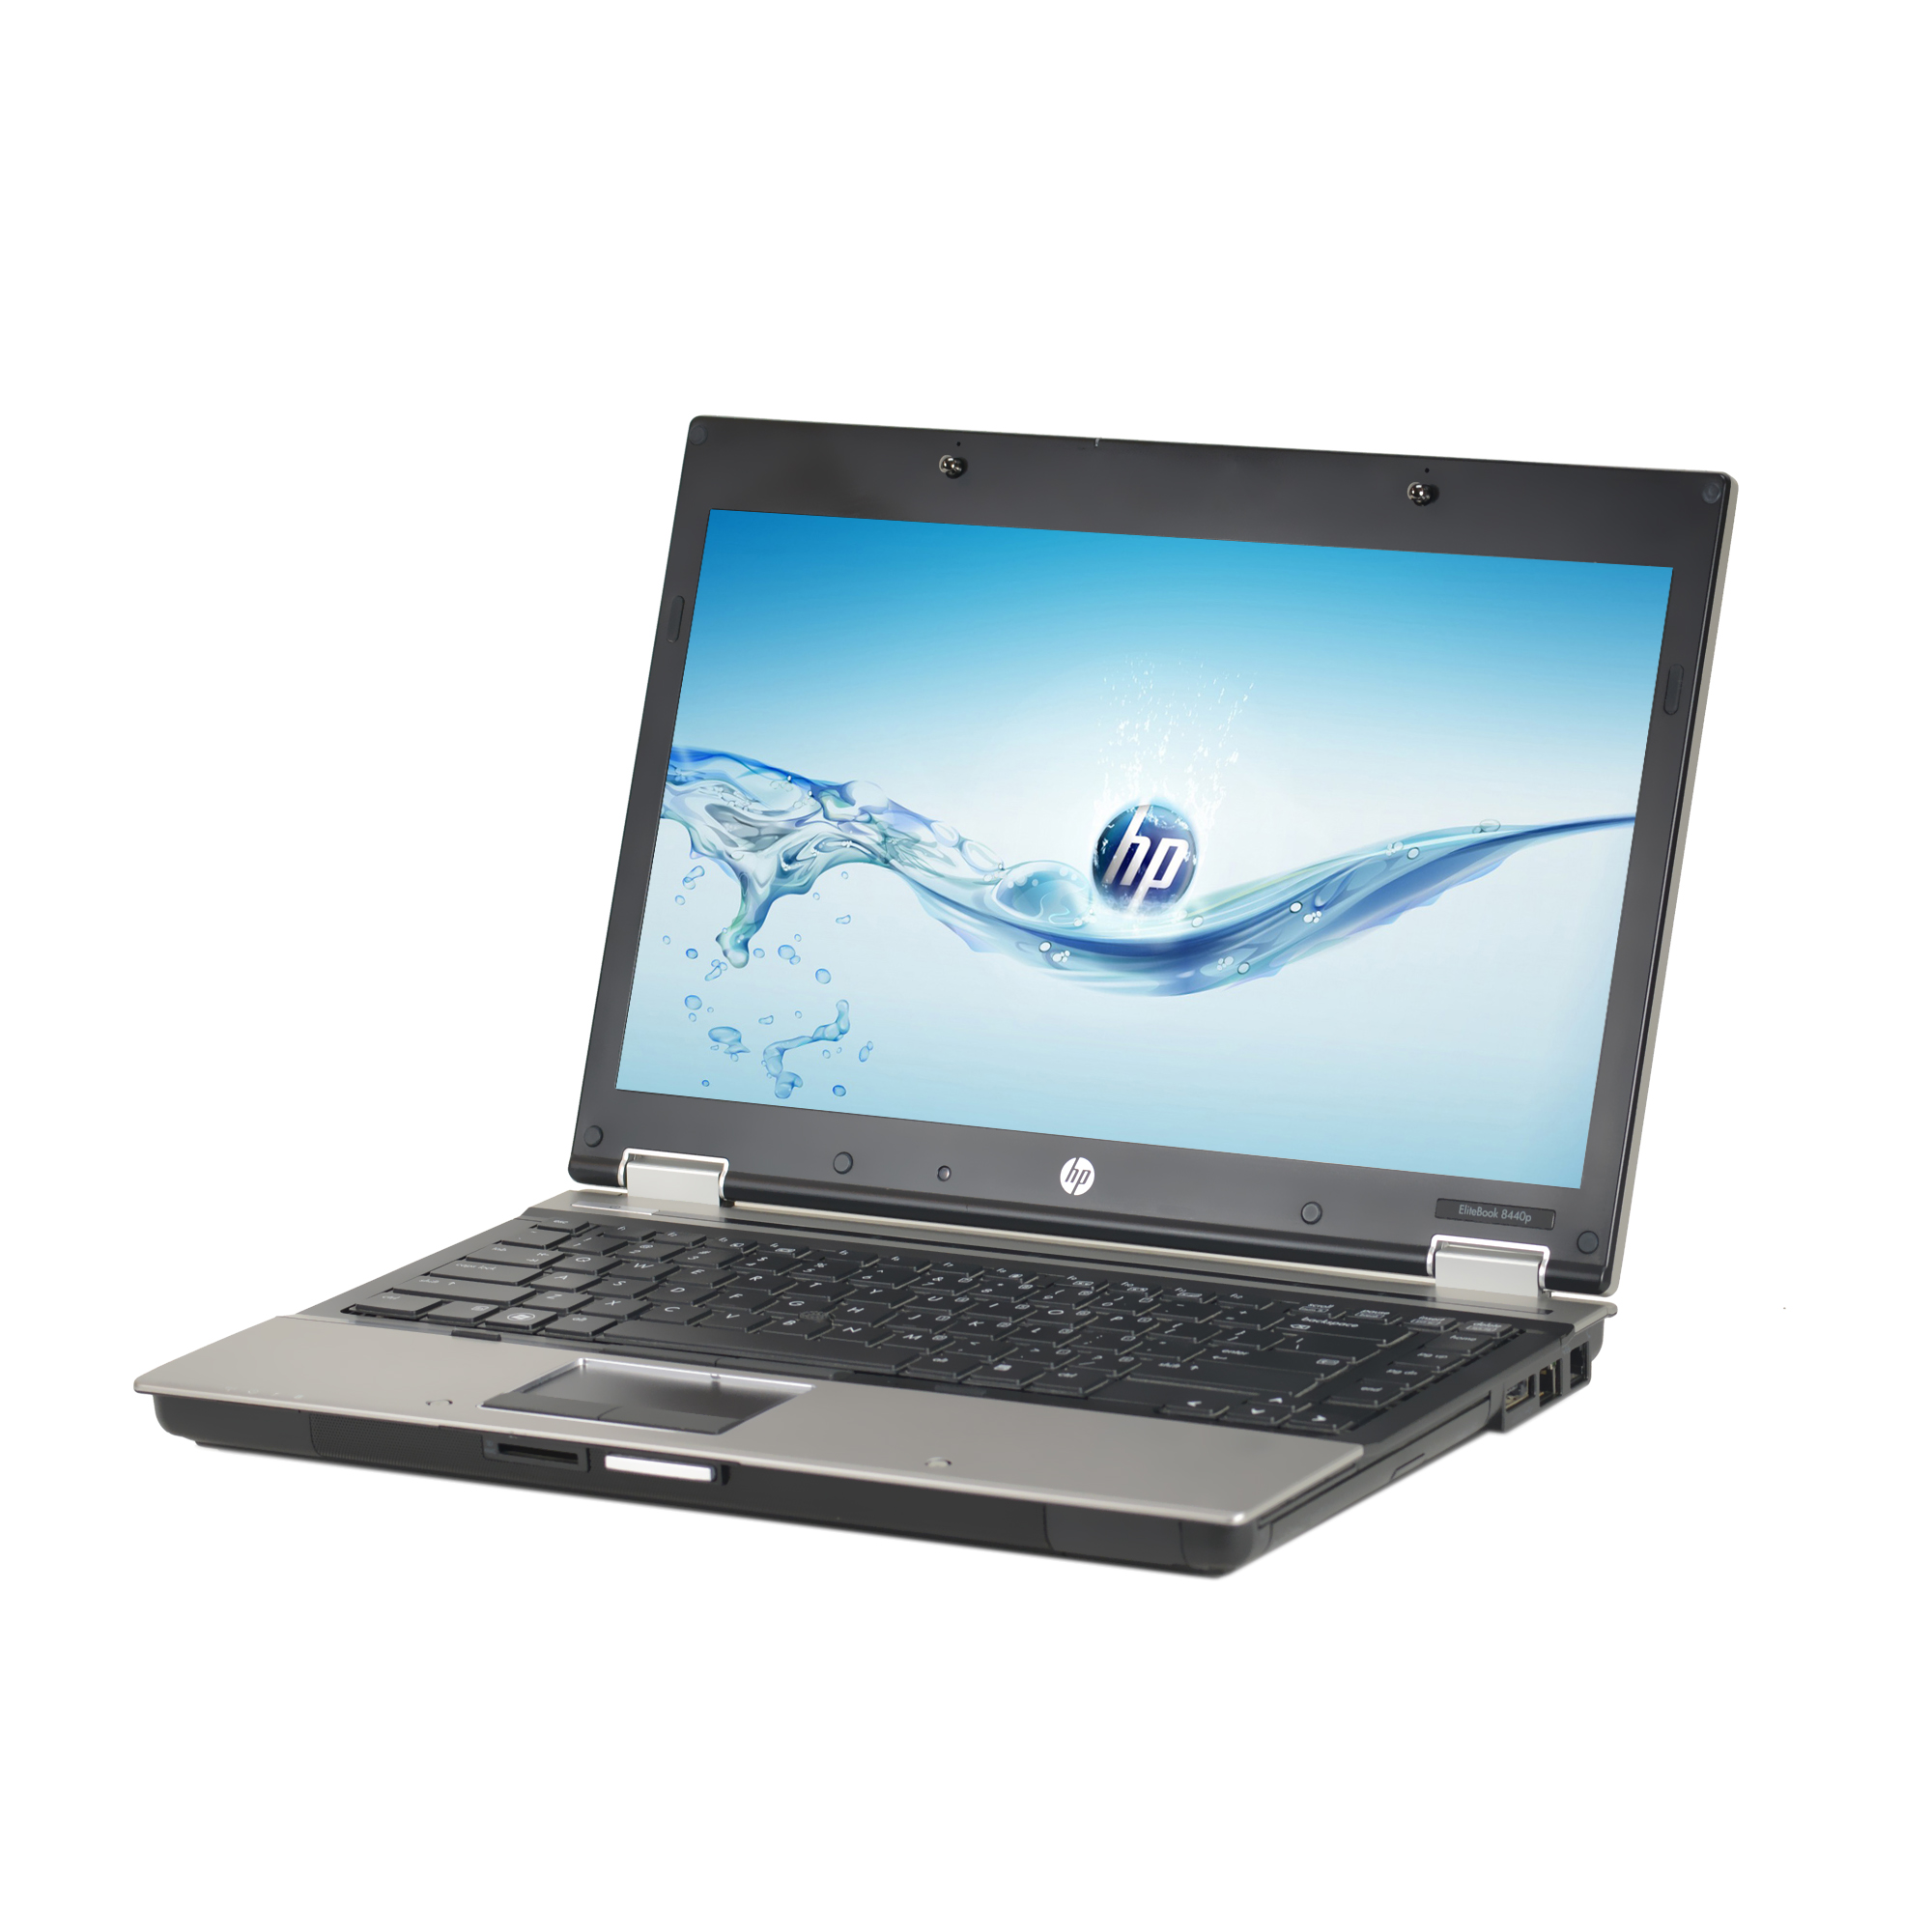 "Refurbished HP Silver 14"" 8440P Laptop PC with Intel Core i5 Processor, 4GB Memory, 320GB Hard Drive and Windows 10 Pro"